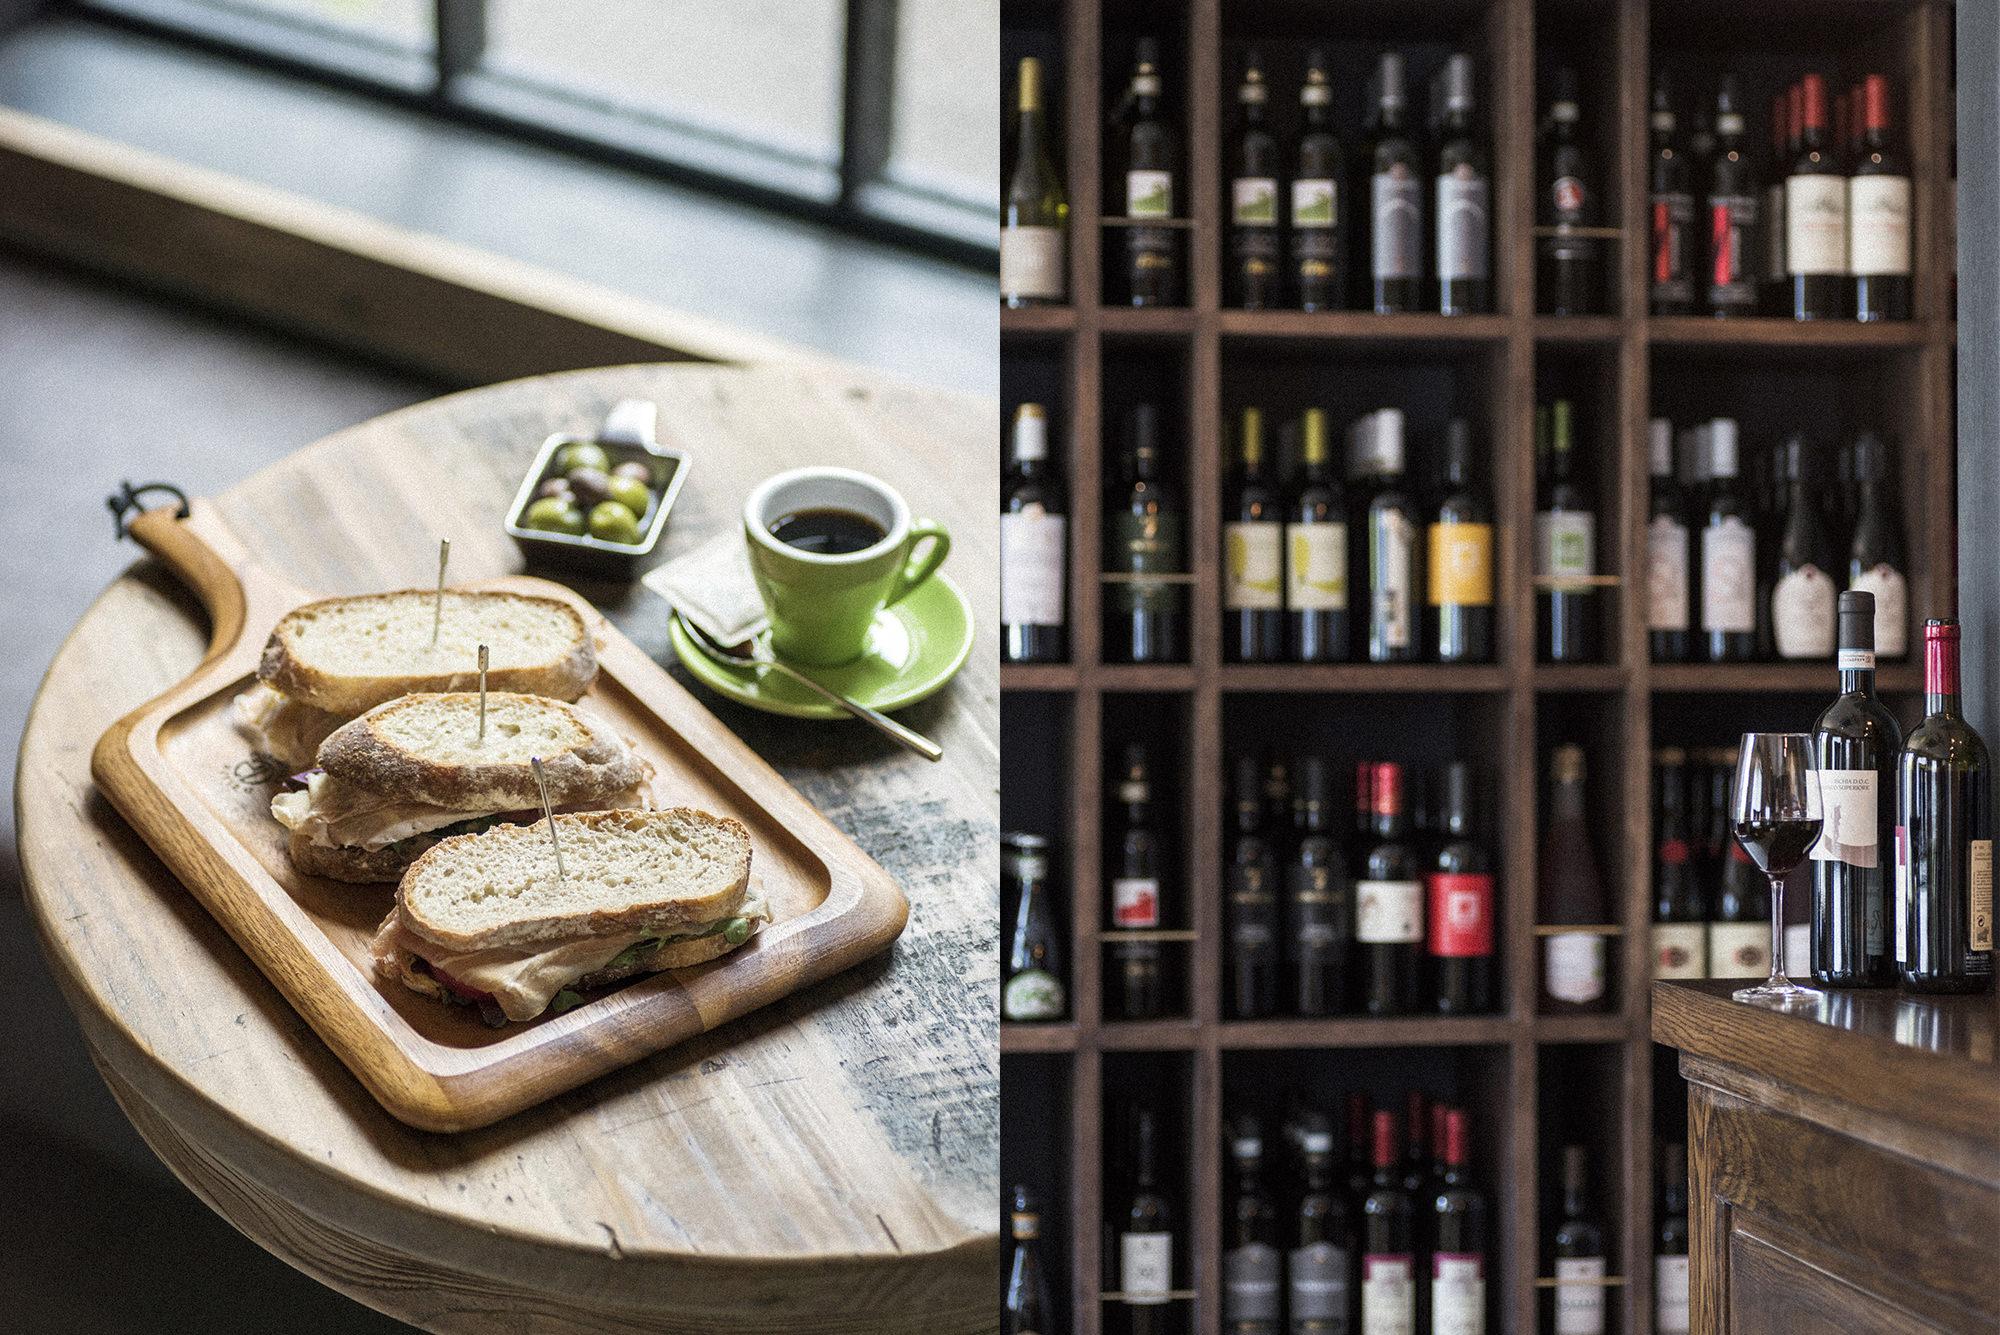 wine & panini image